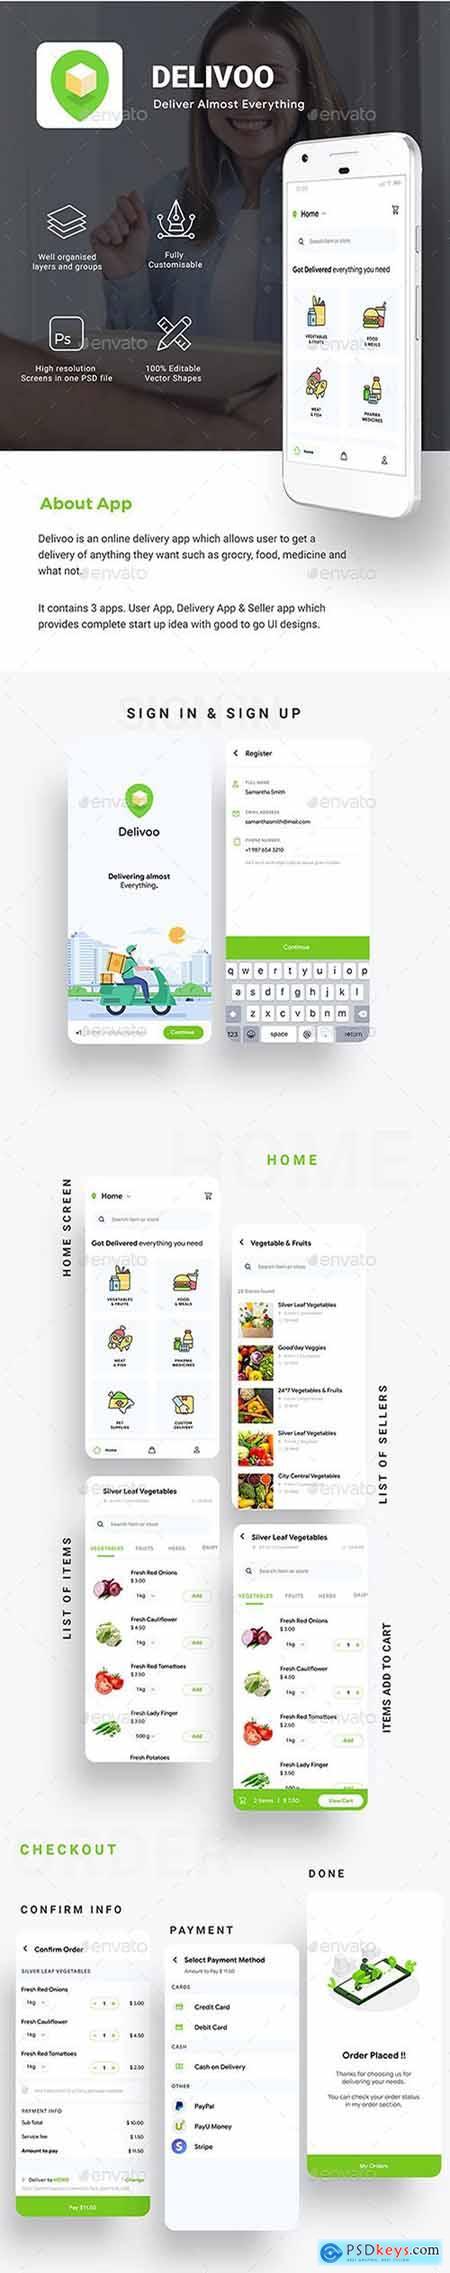 Moden Custom Delivery for Food, Grocery, Medicine etc App UI - Delivoo 26442059